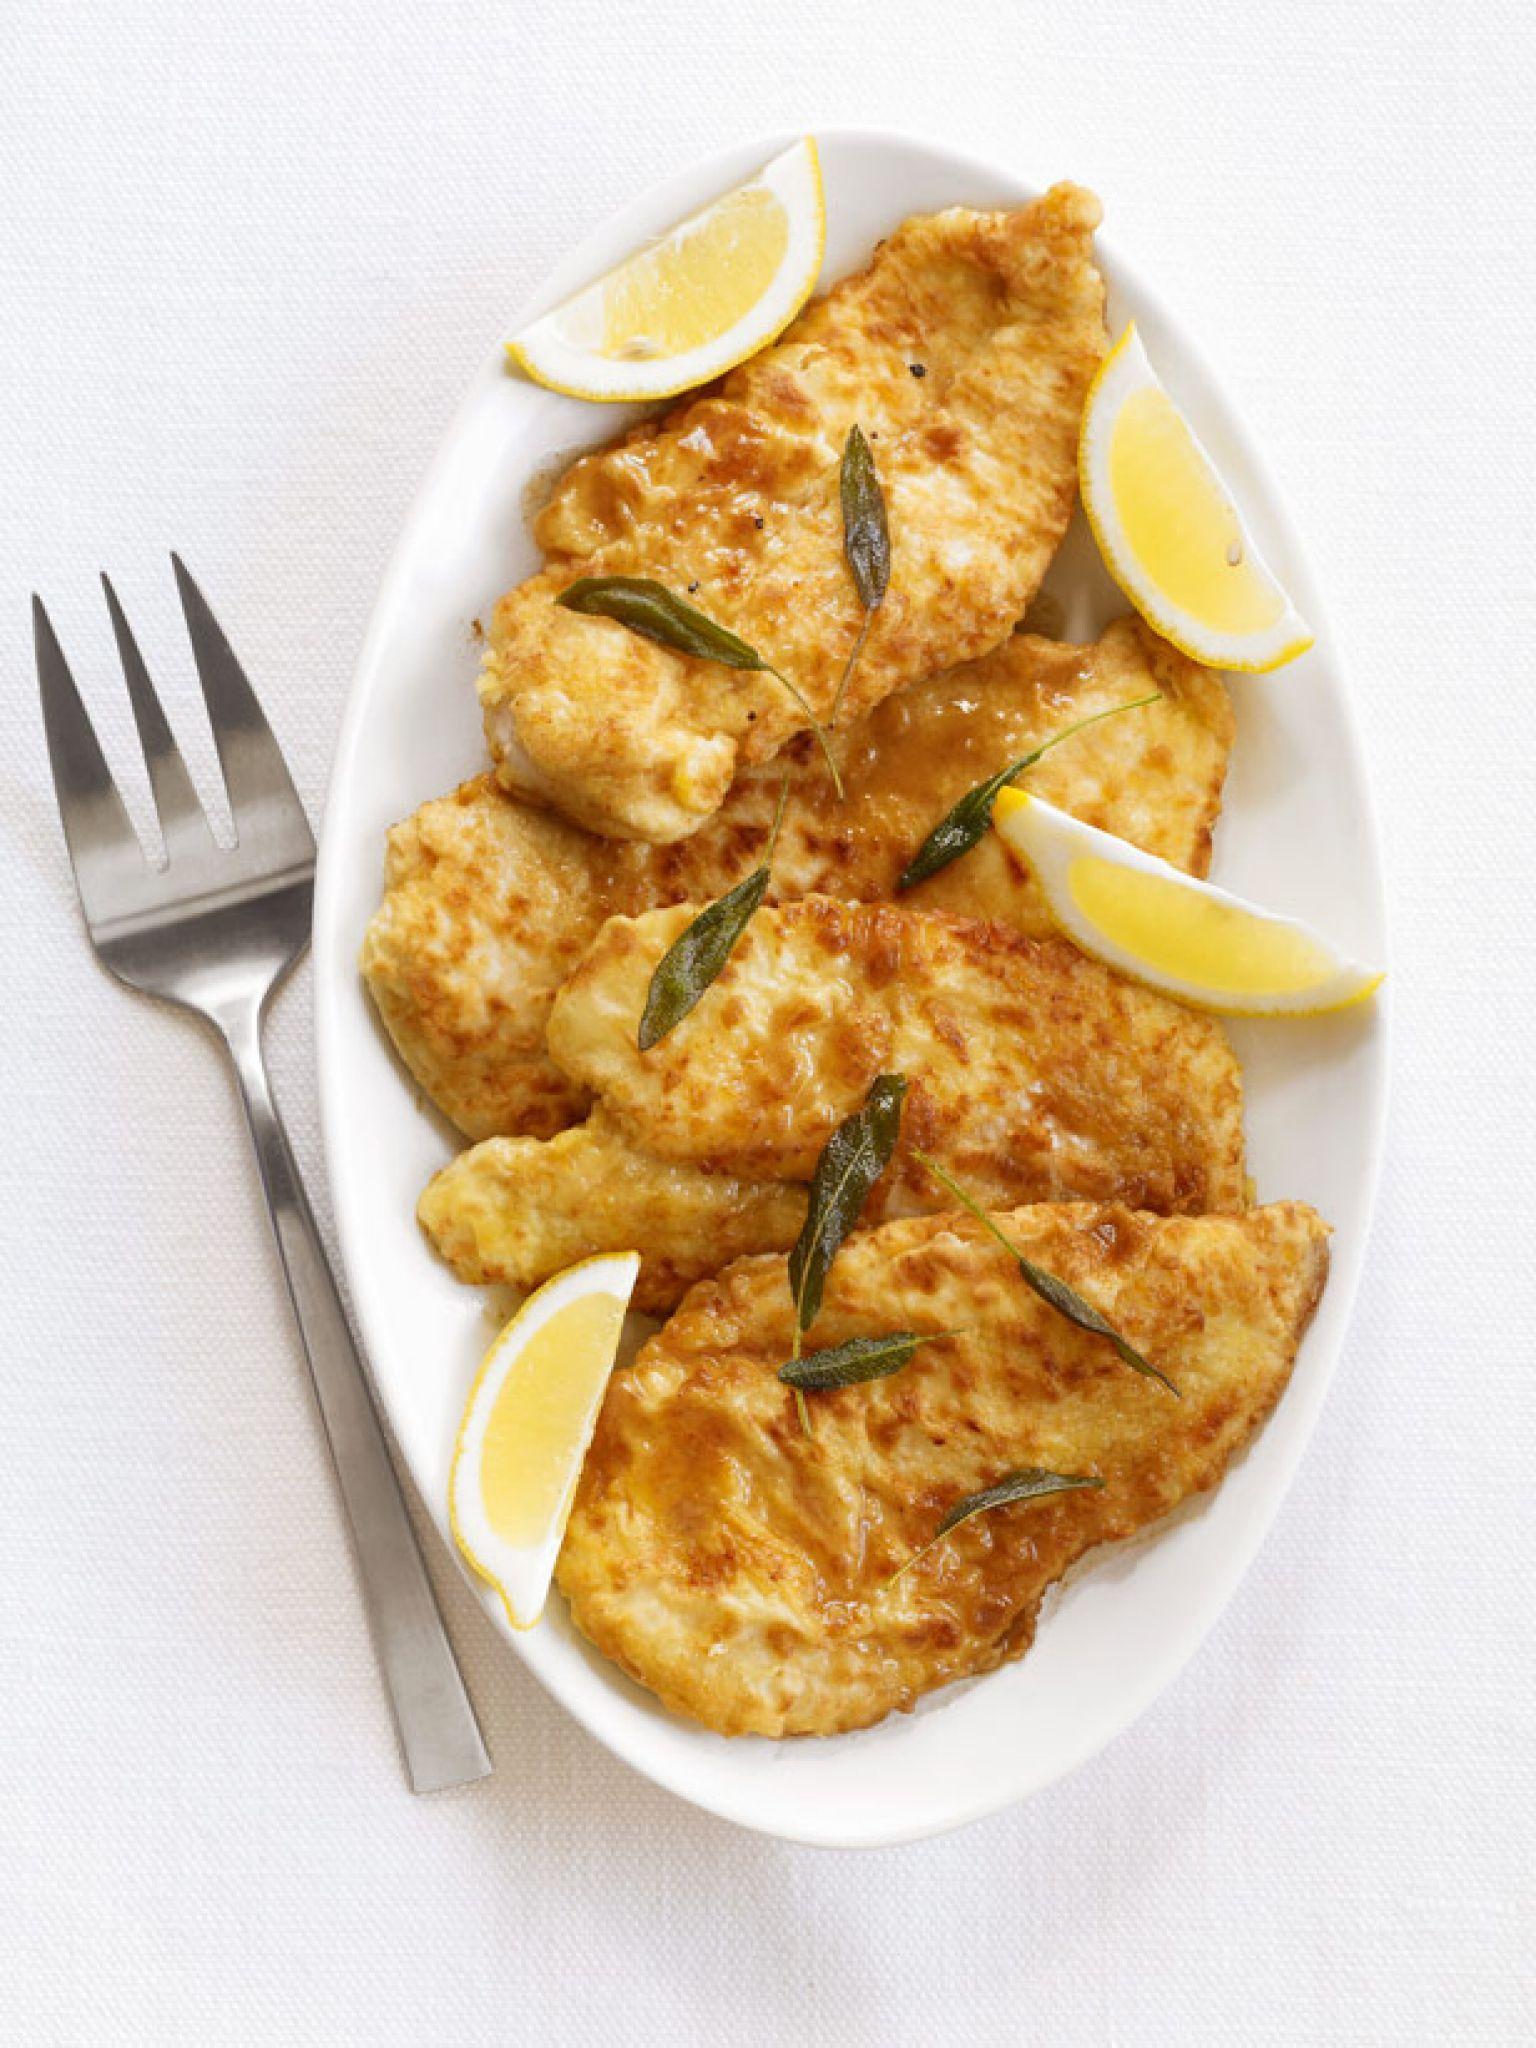 Lemon sage chicken cutlets receta lemon sage chicken cutlets forumfinder Images